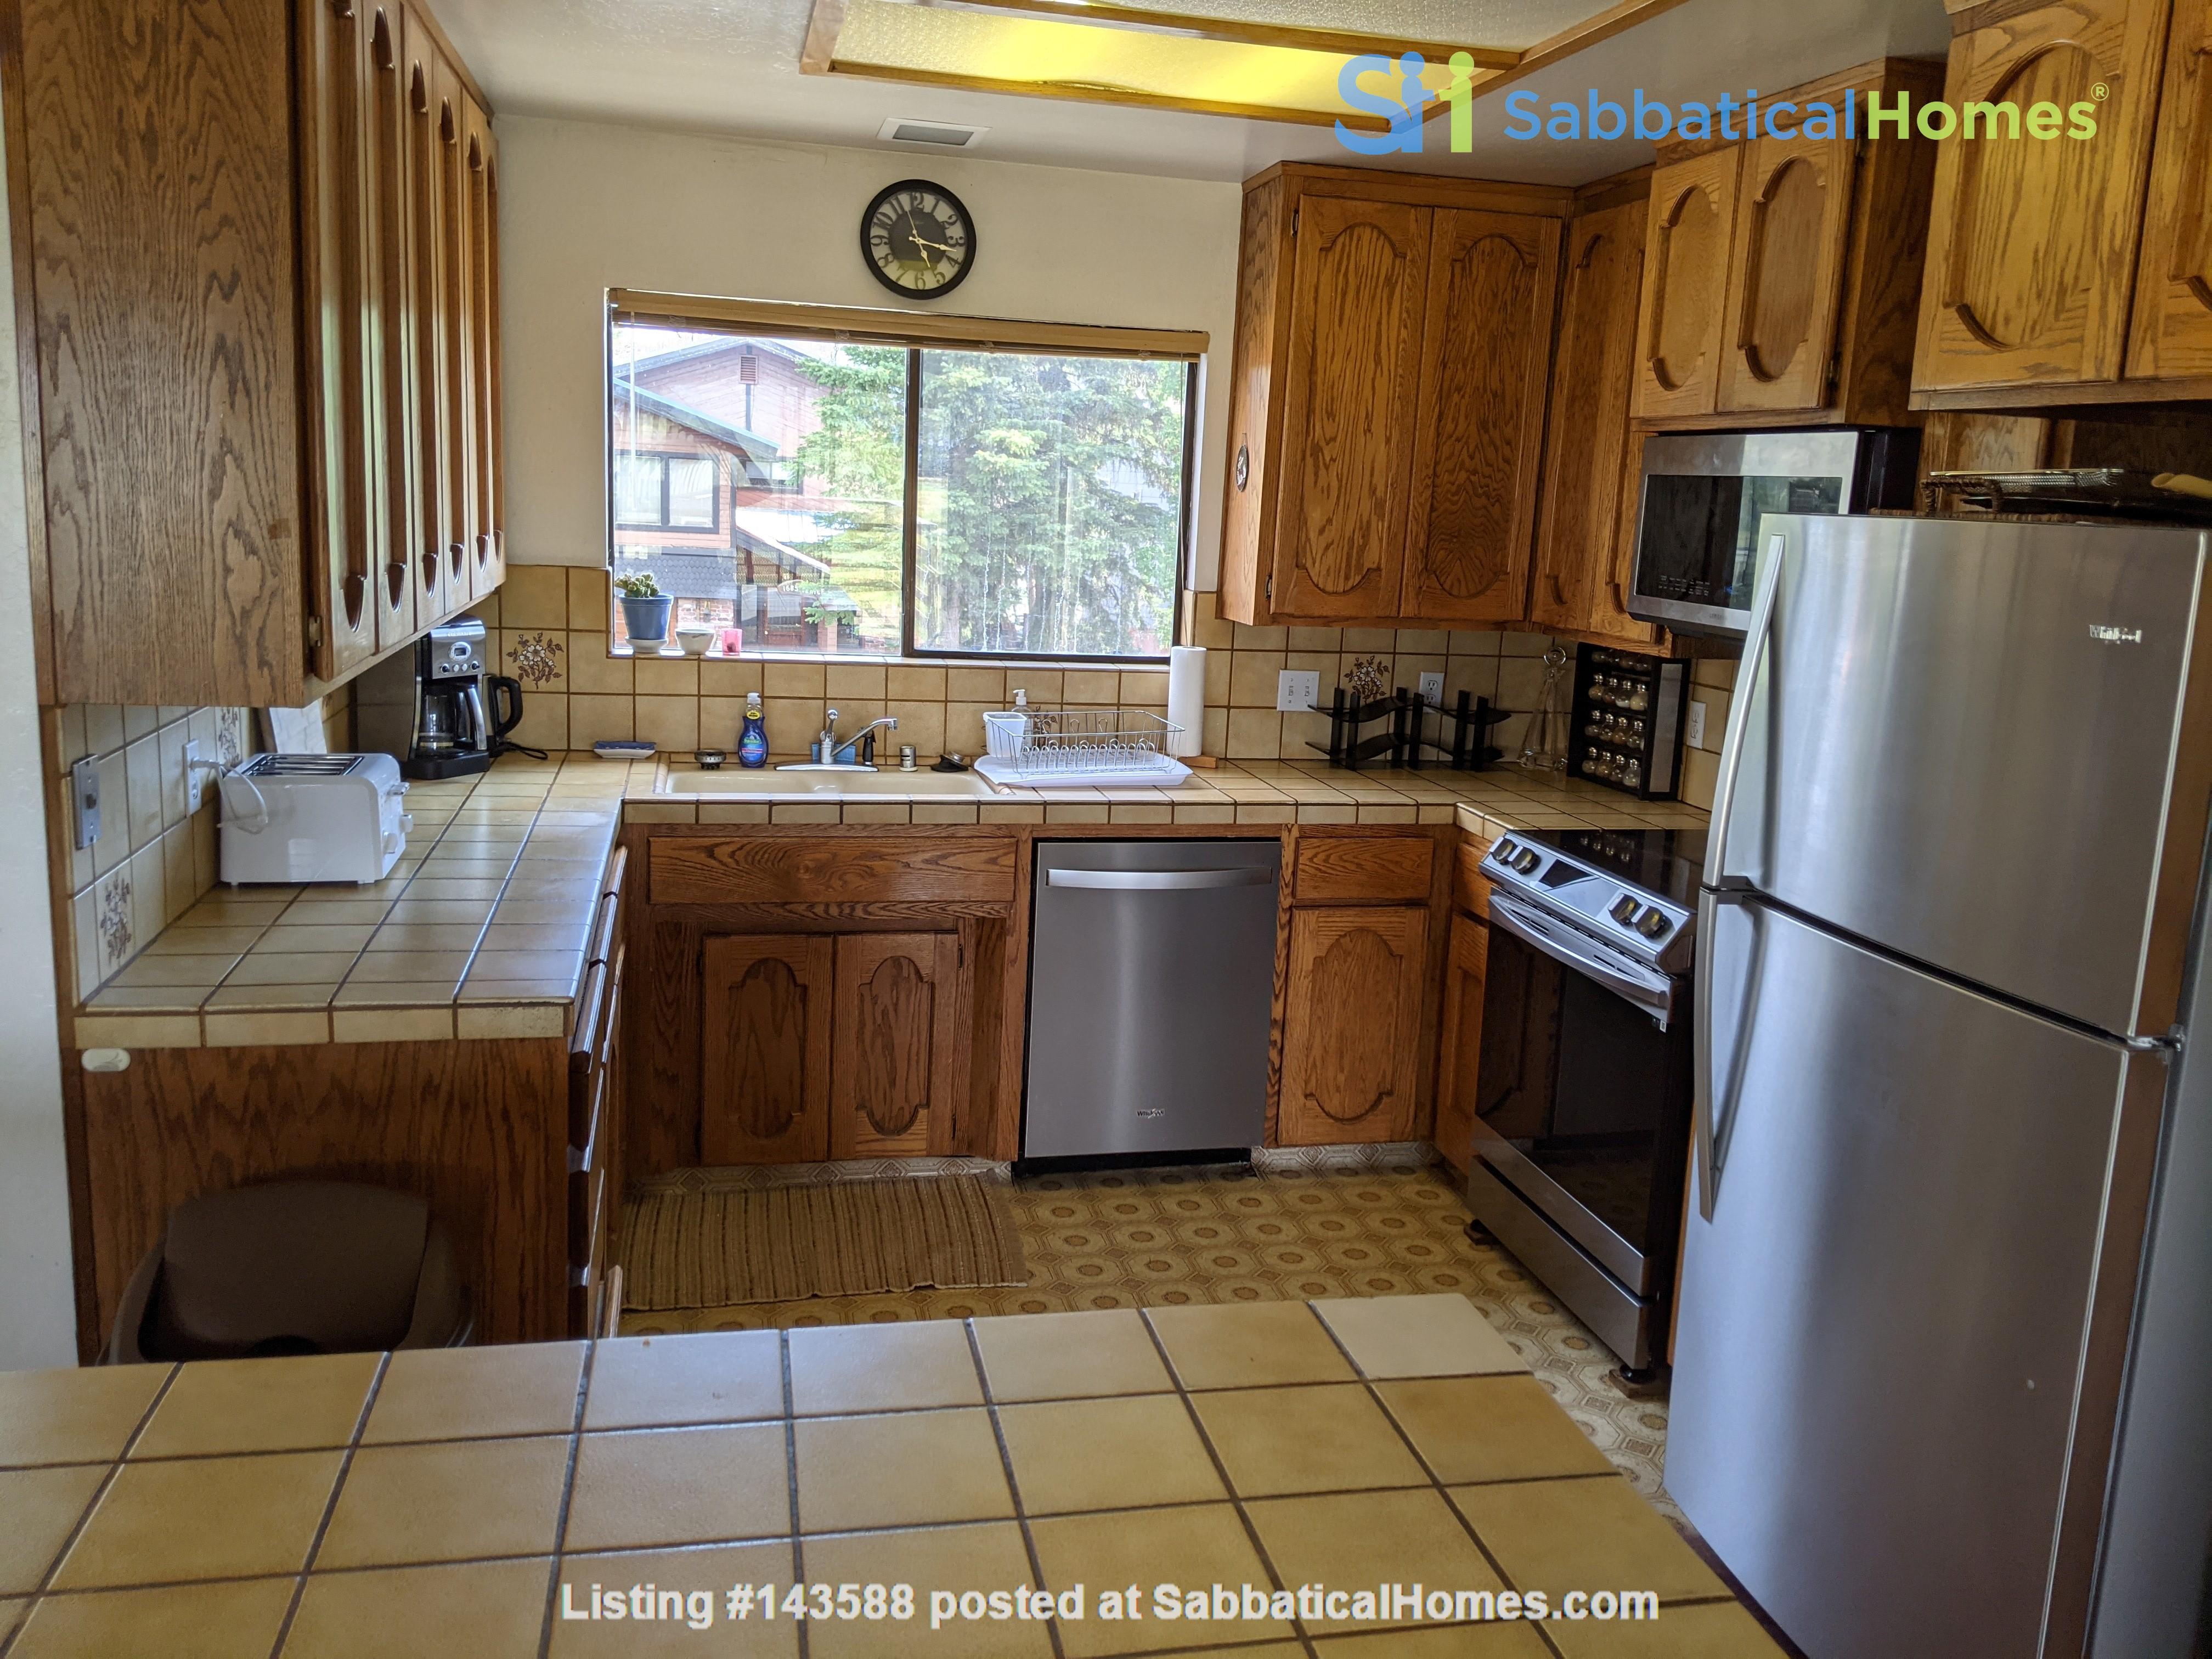 LAKE VIEWS Tahoe Keys 3br 2.5 ba. SPA. New appliances. Barton close Home Rental in South Lake Tahoe, California, United States 4